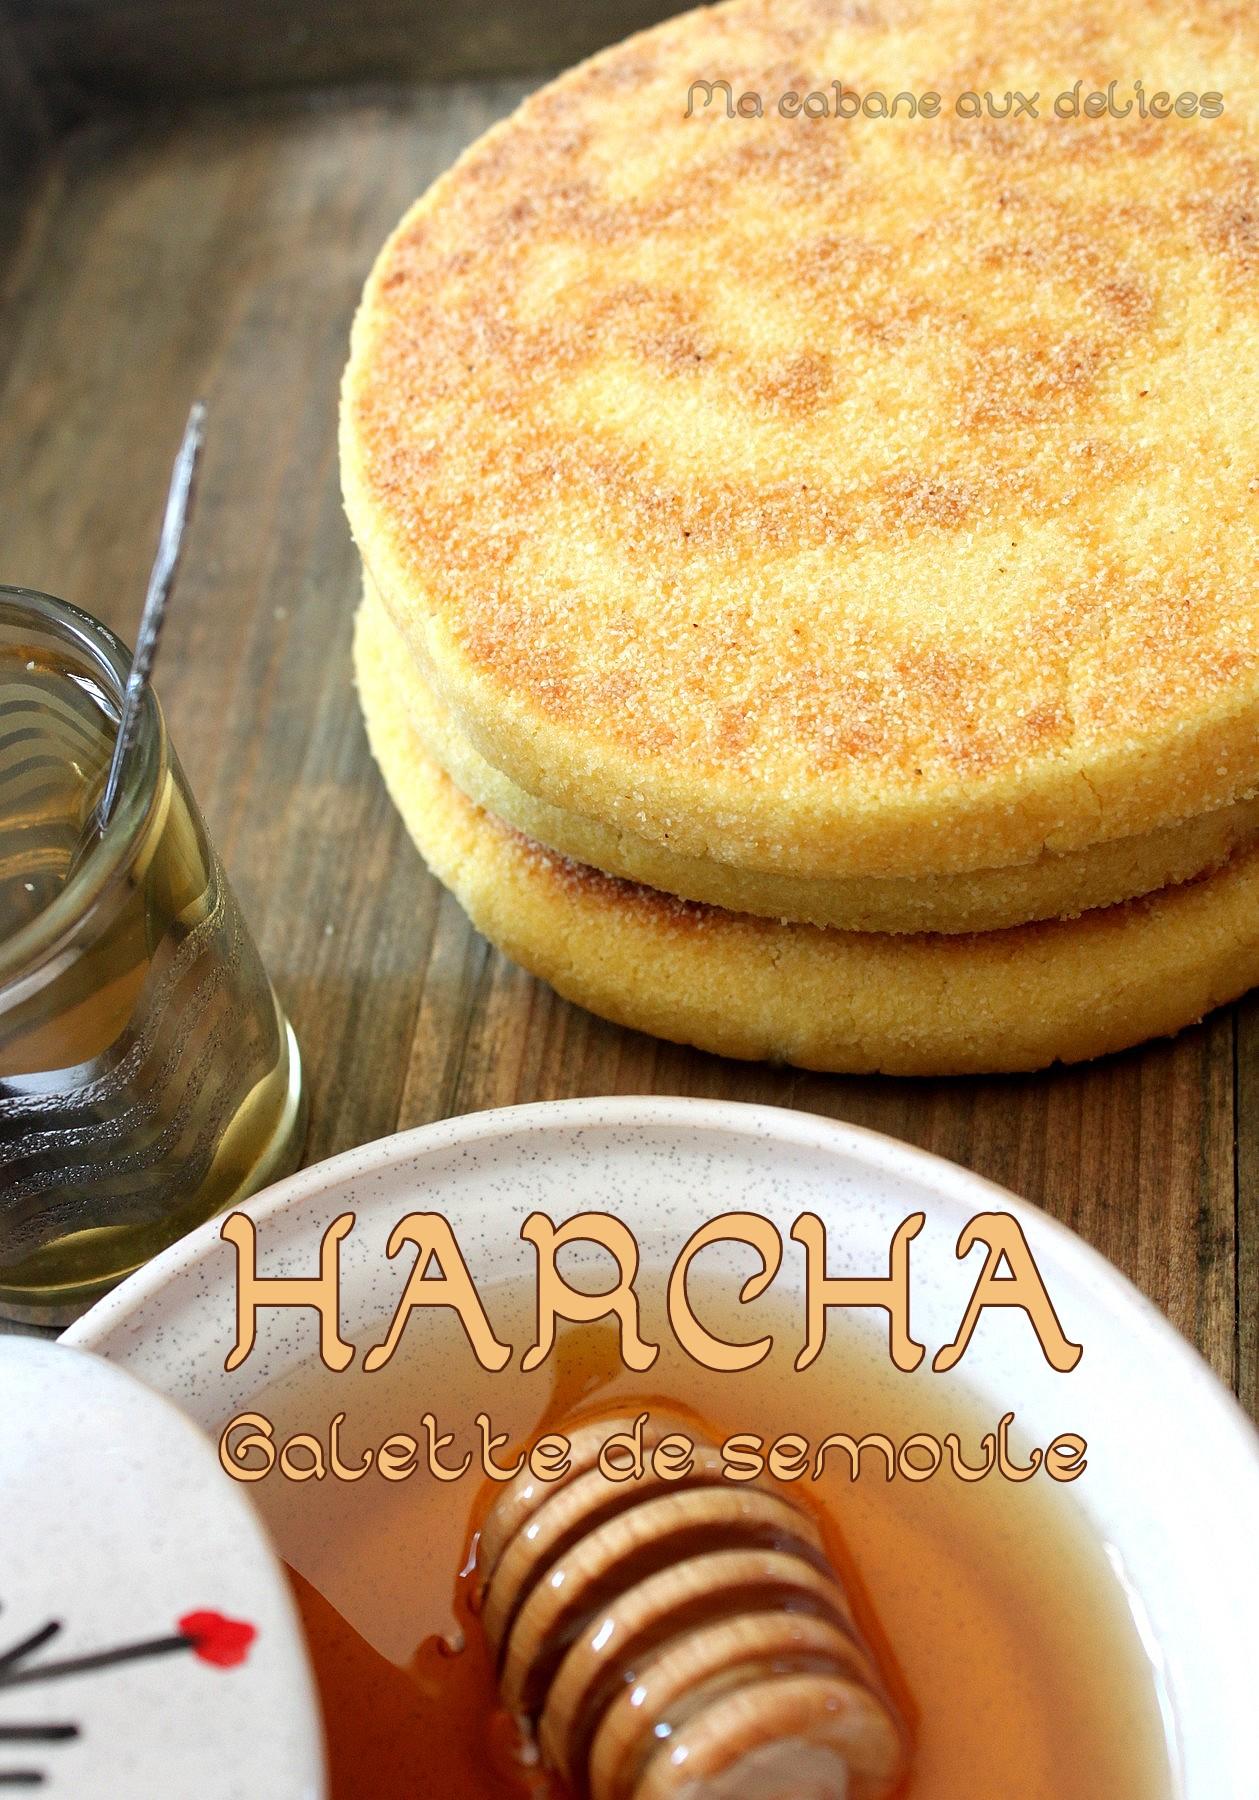 Harsha galette à la semoule moyenne